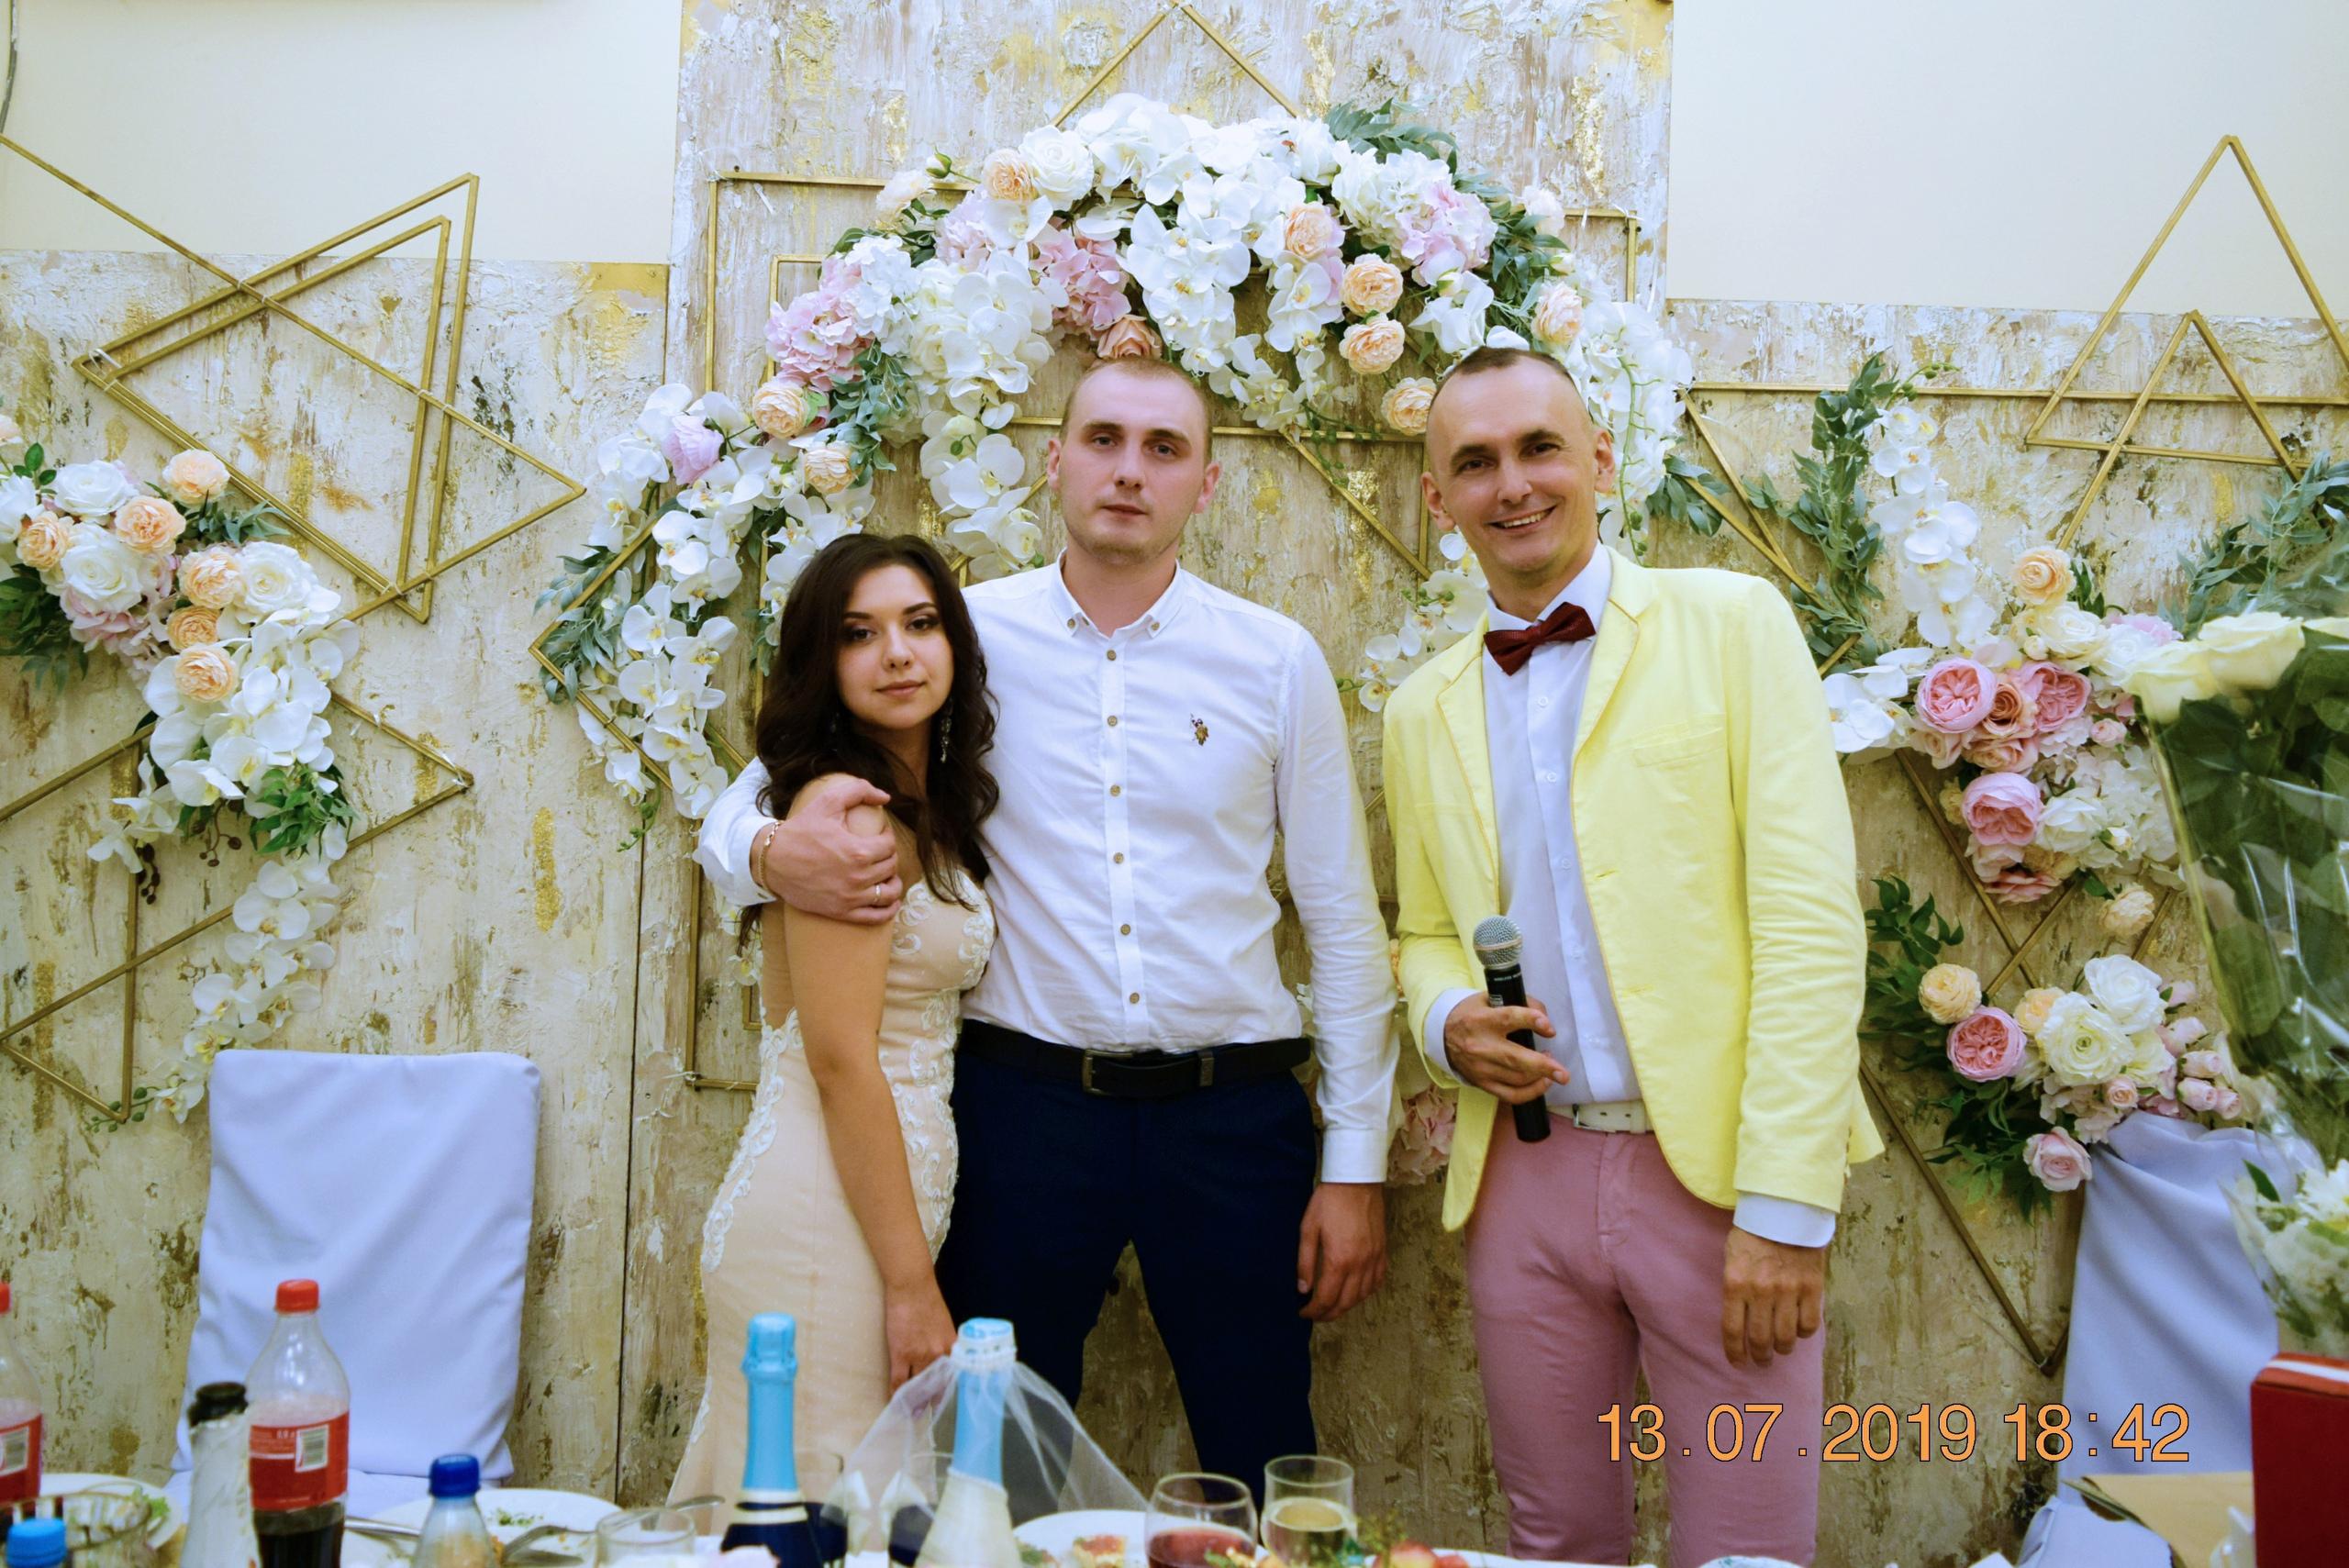 TagieYzTZf4 - Свадьба Александра и Анастасии